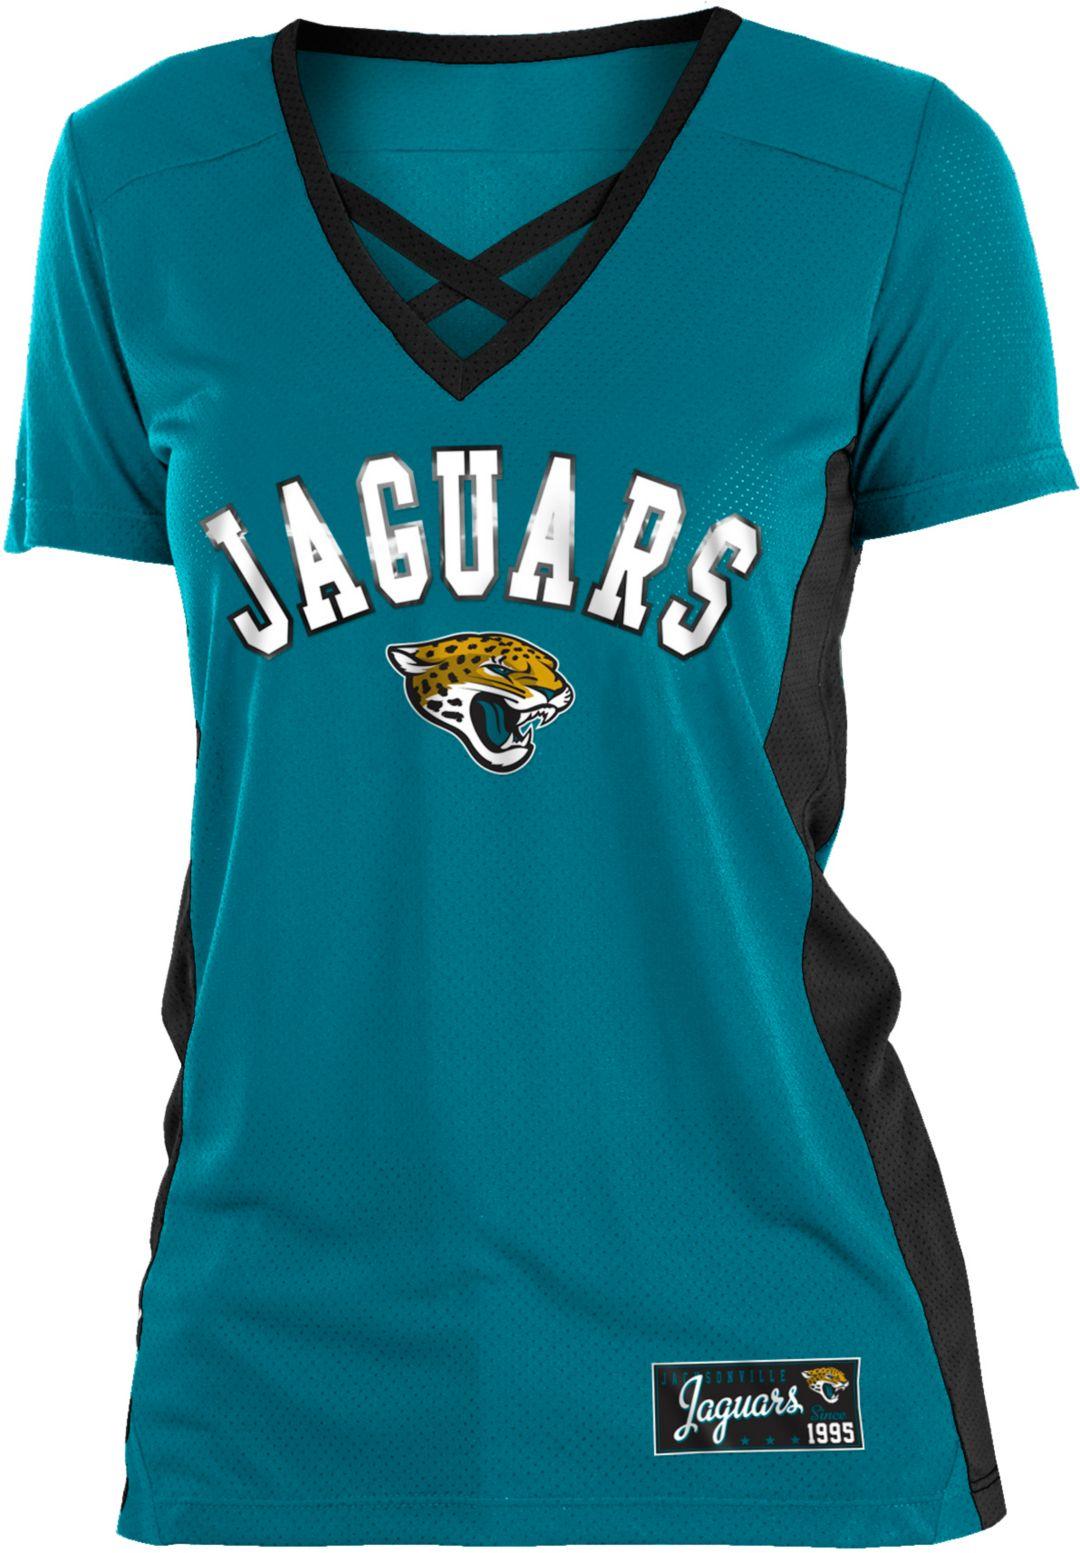 44237298 NFL Team Apparel Women's Jacksonville Jaguars Mesh X Teal T-Shirt